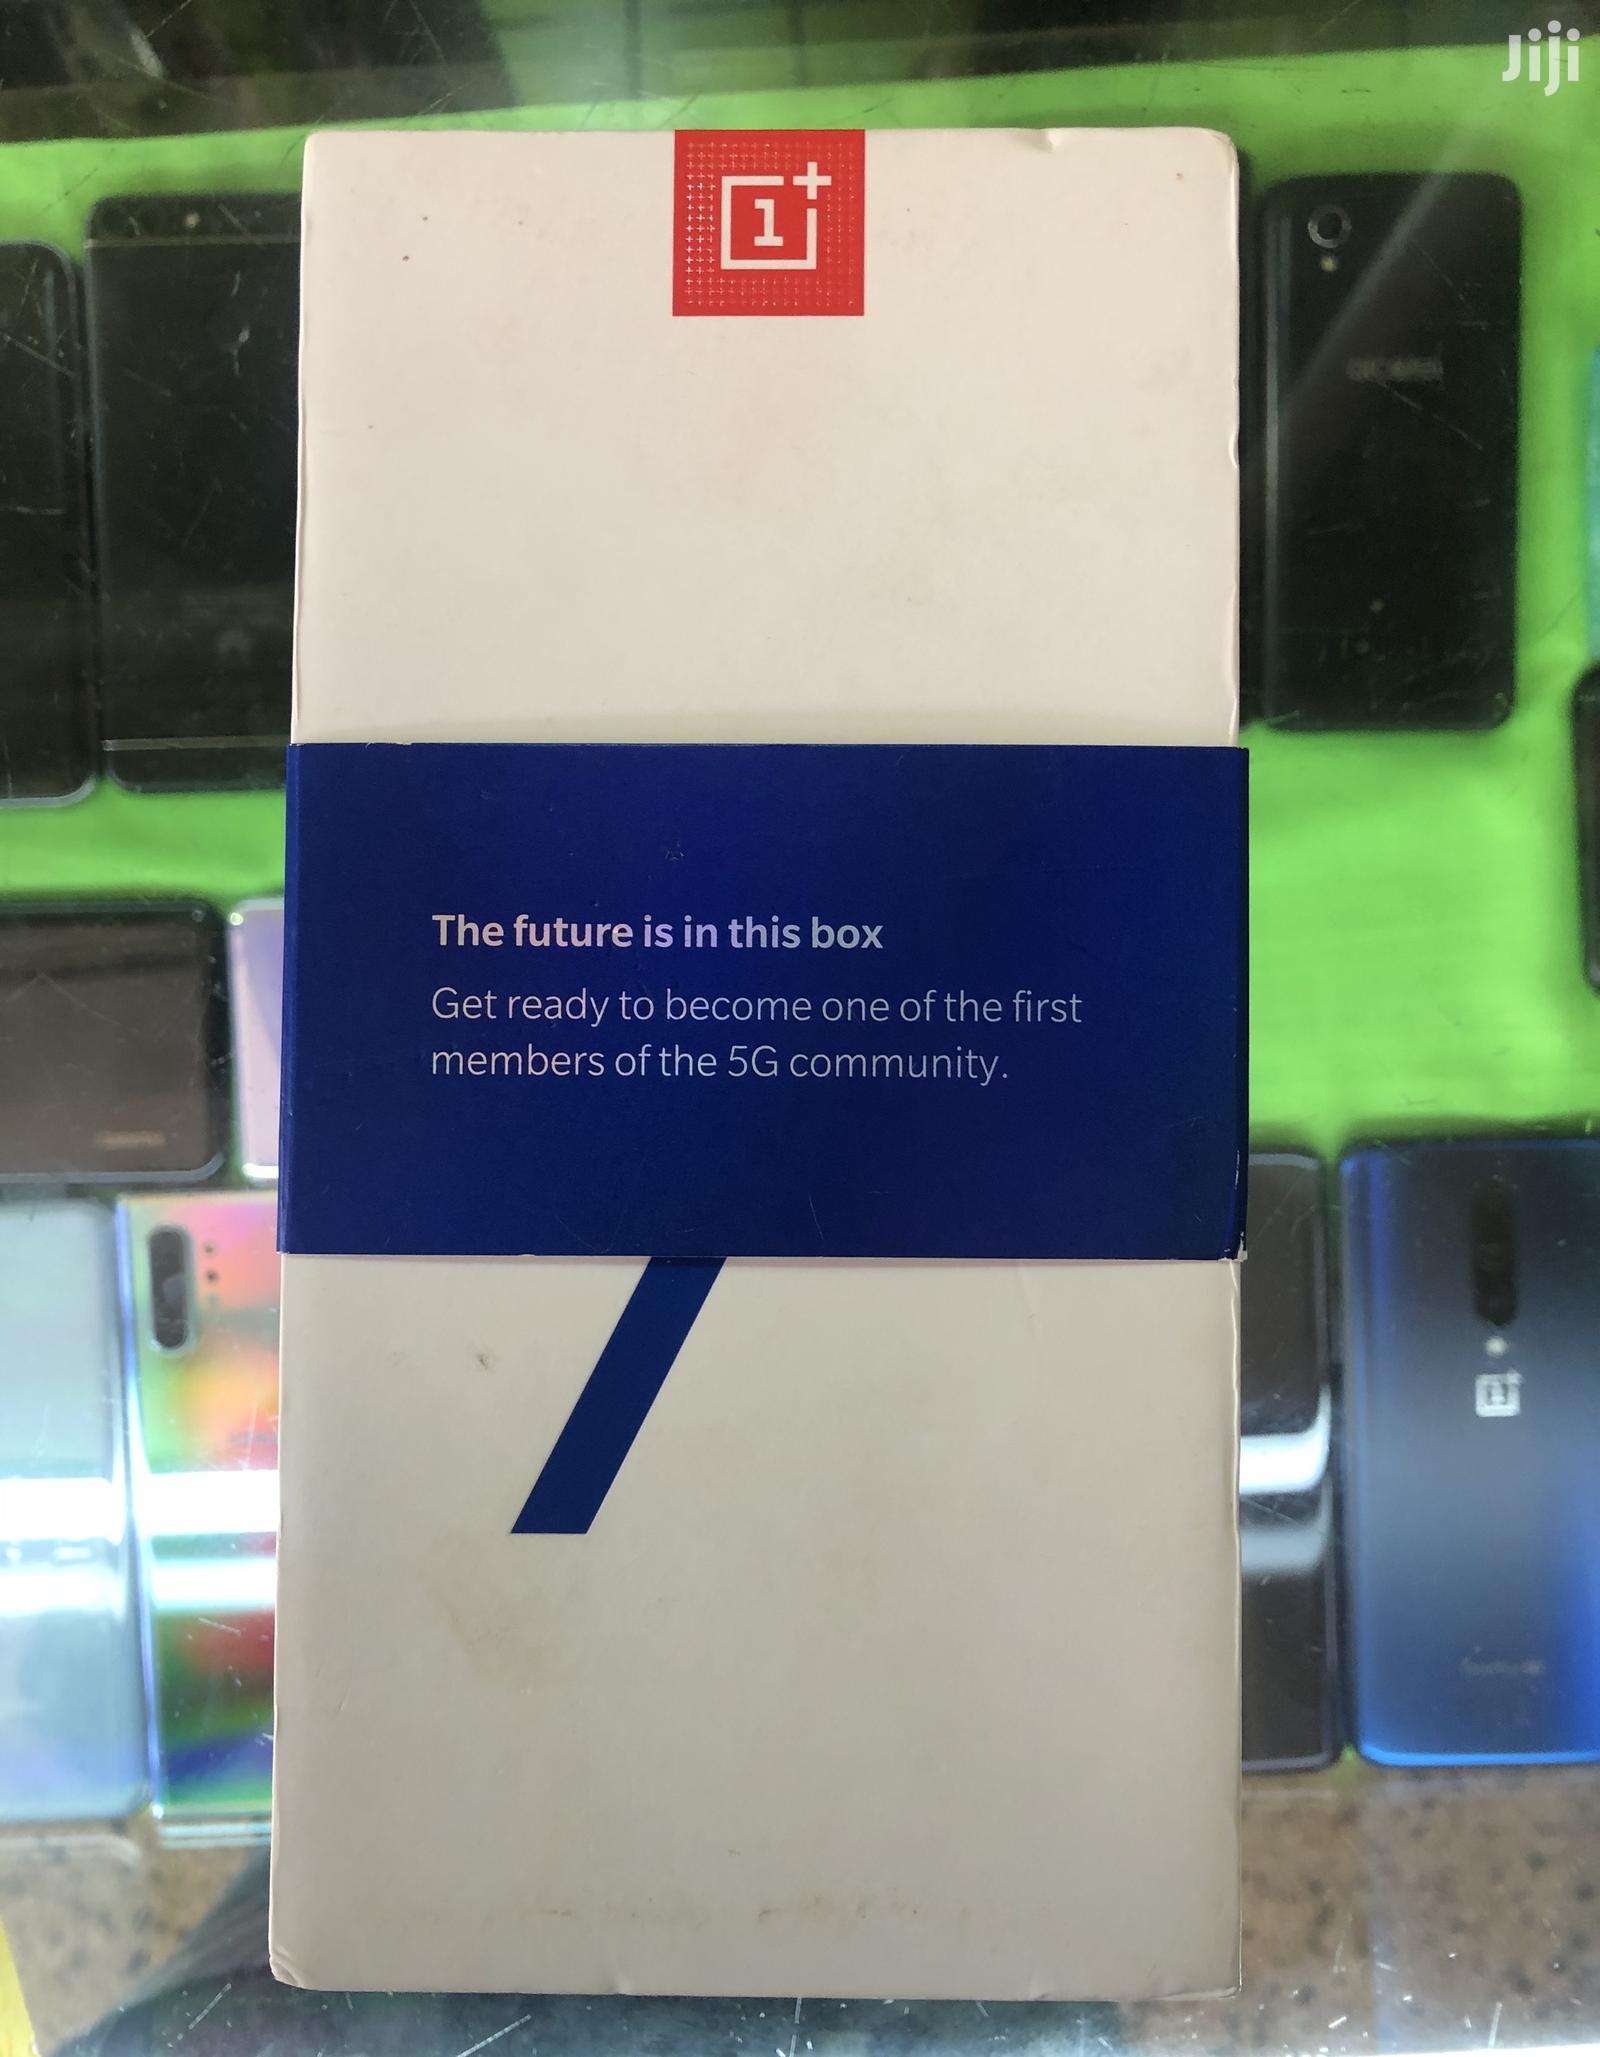 New OnePlus 7T Pro 5G McLaren 256 GB Blue | Mobile Phones for sale in Kampala, Central Region, Uganda